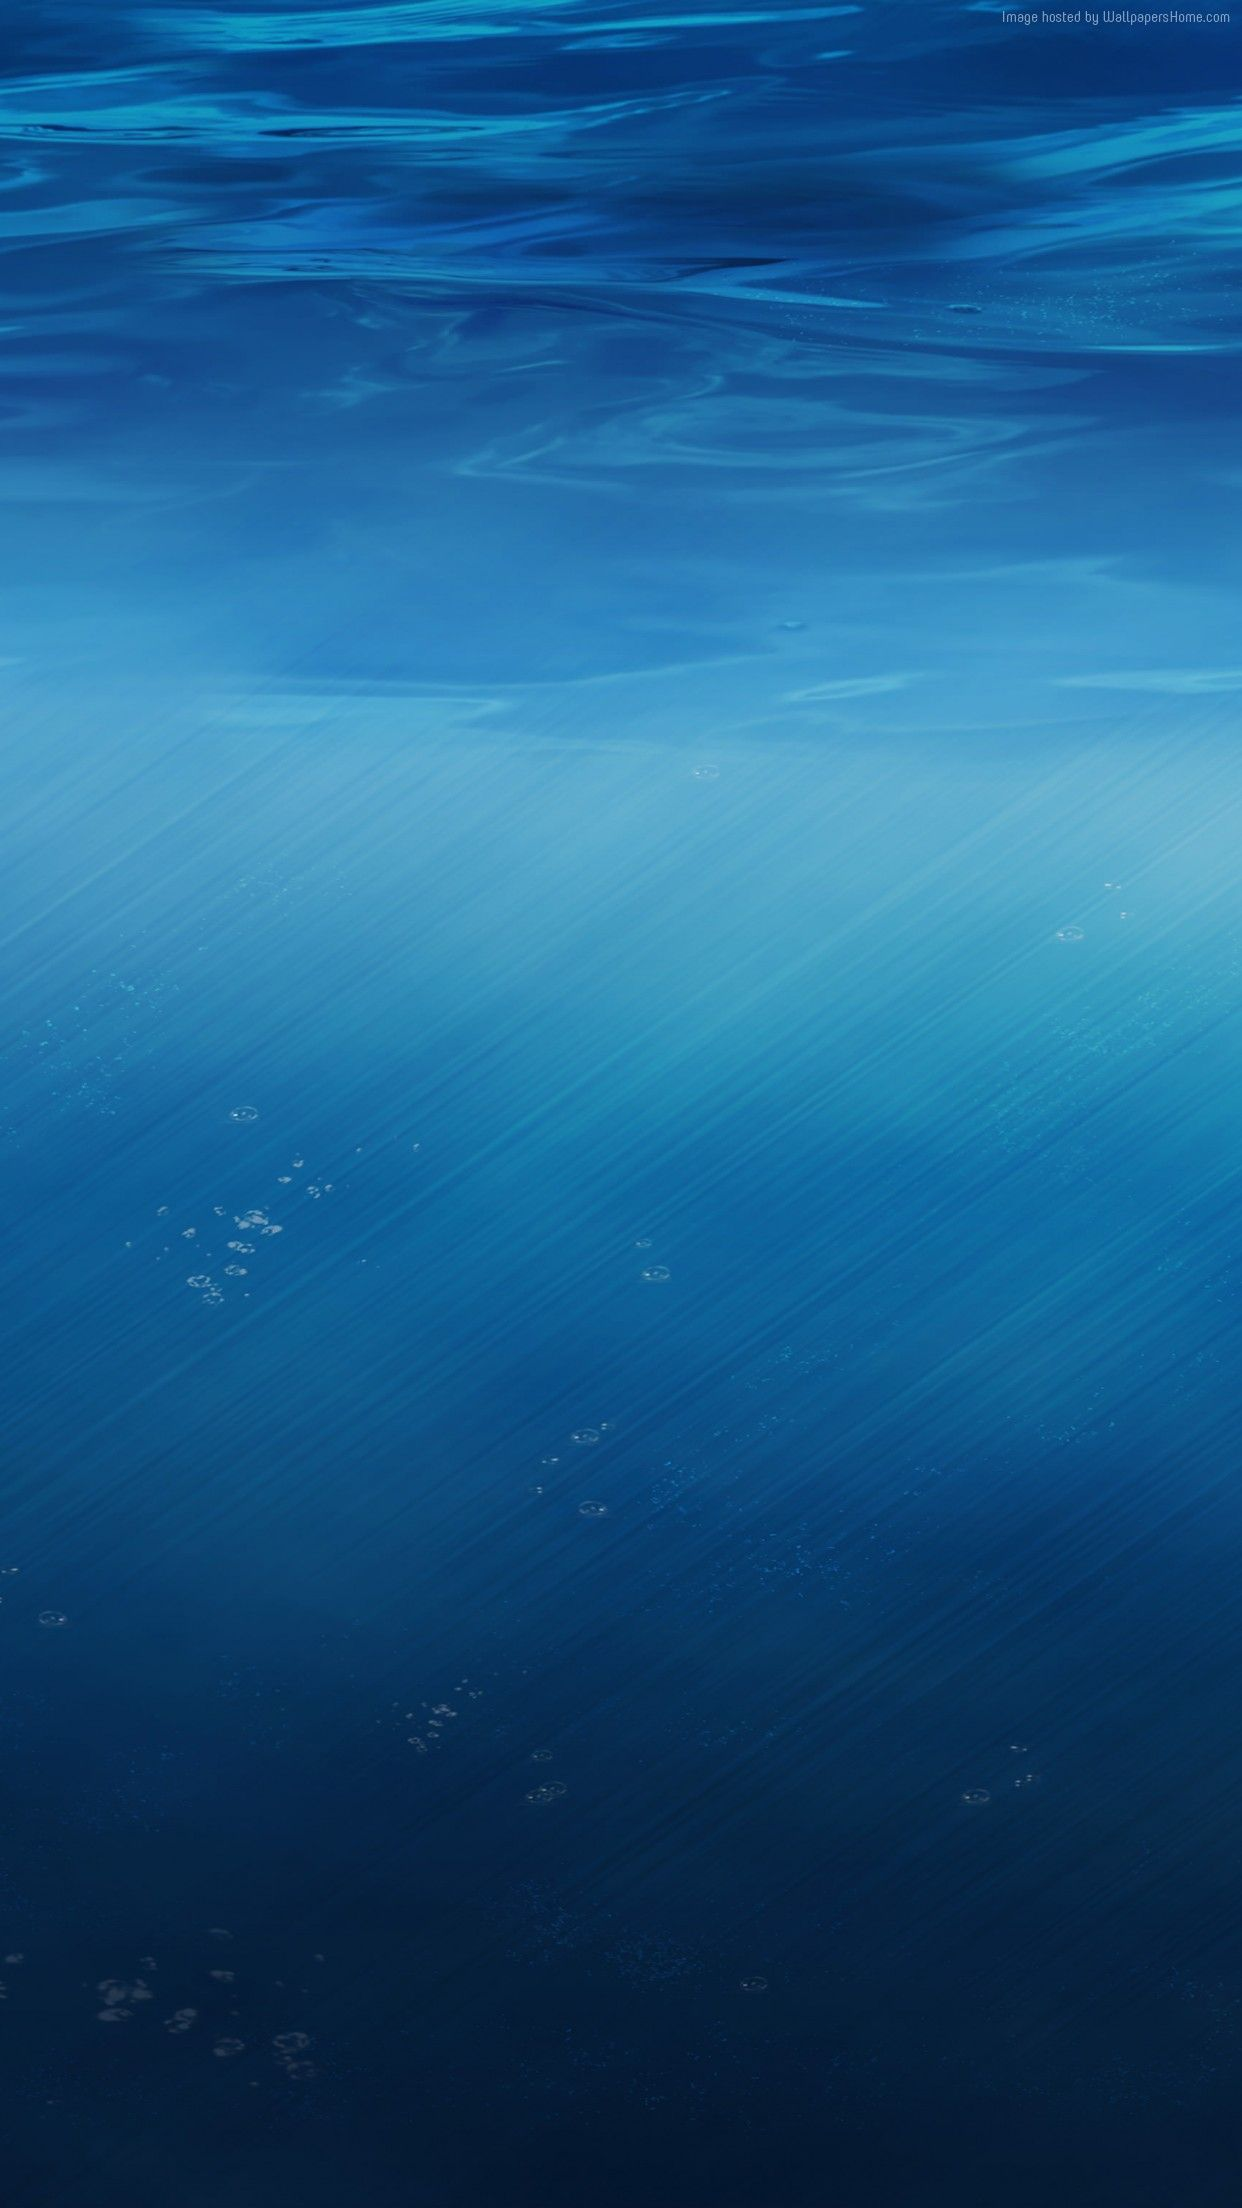 Blue Water Ocean Sea Wallpaper Iphone Clean Colour Minimal